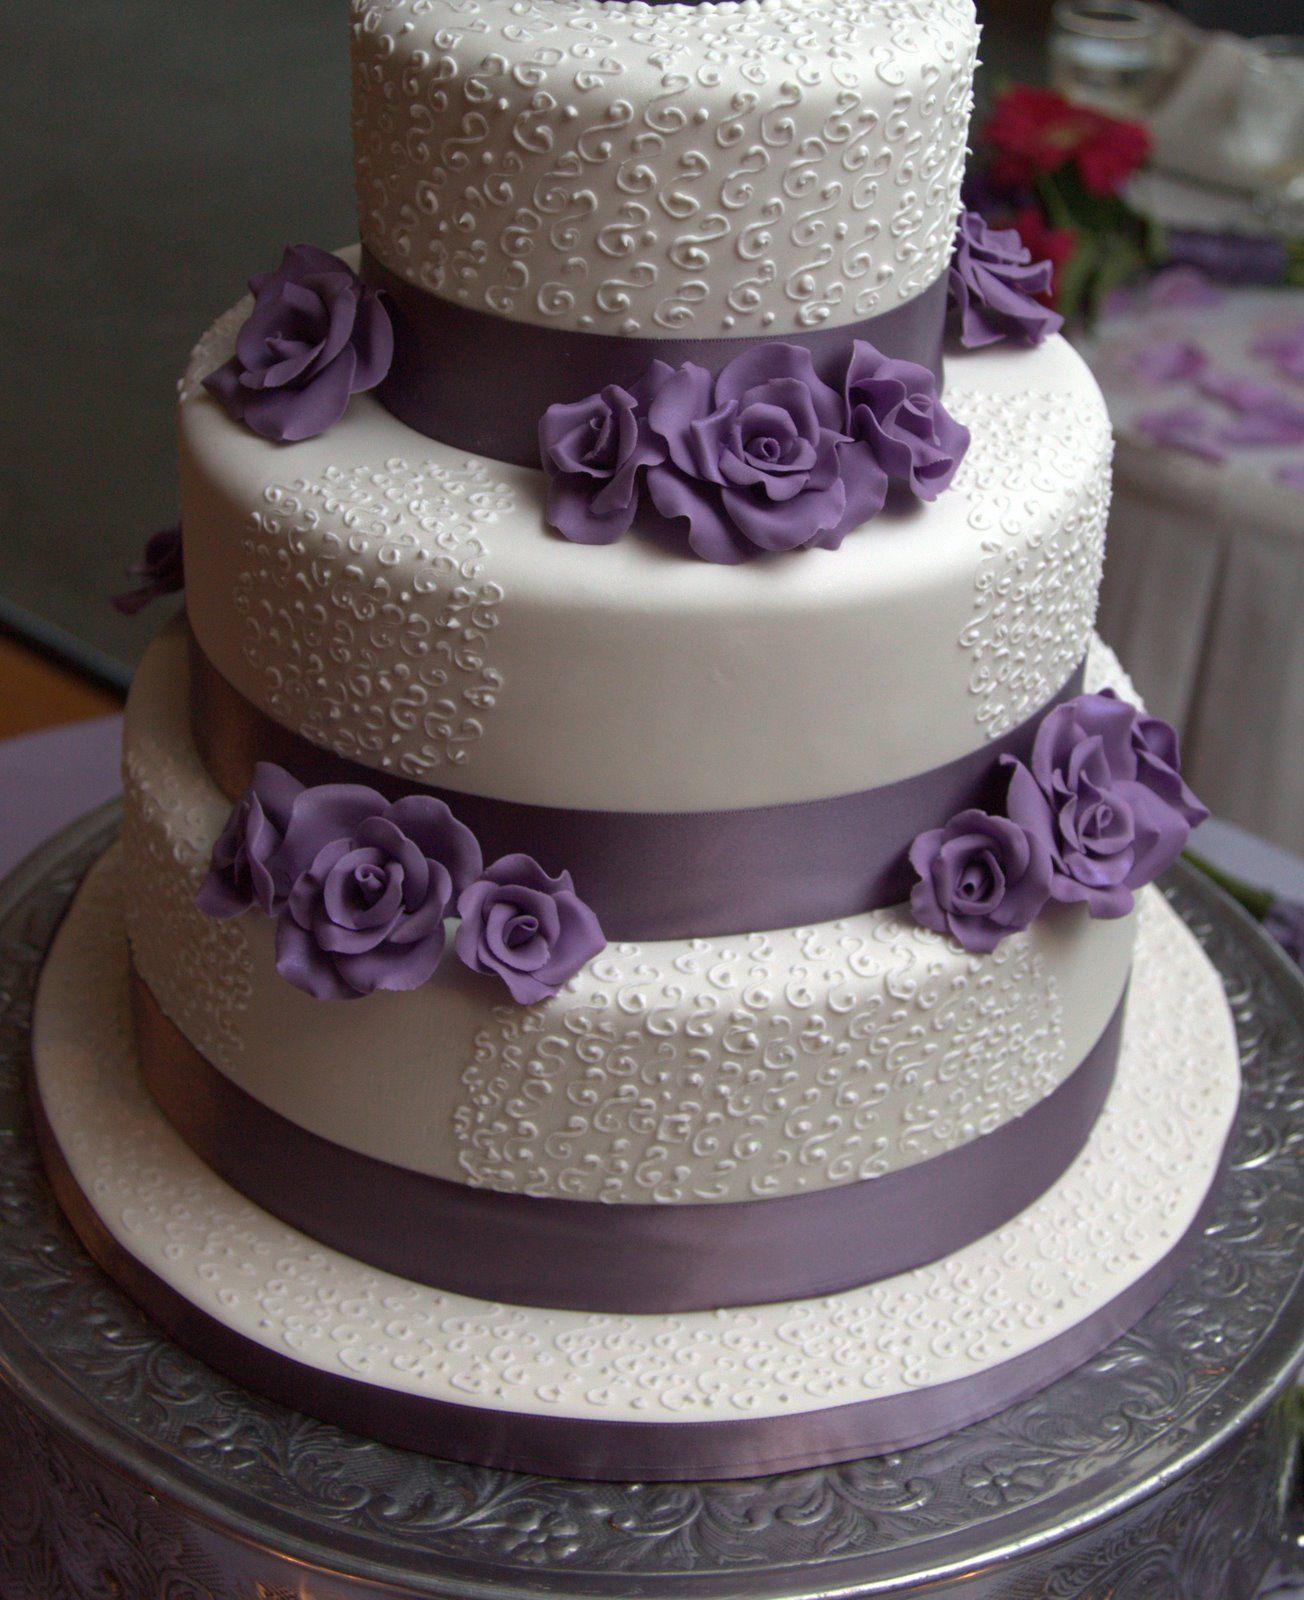 buttercream wedding cakes no fondant amazing grace cakes brenda 39 s wedding cake favors my. Black Bedroom Furniture Sets. Home Design Ideas